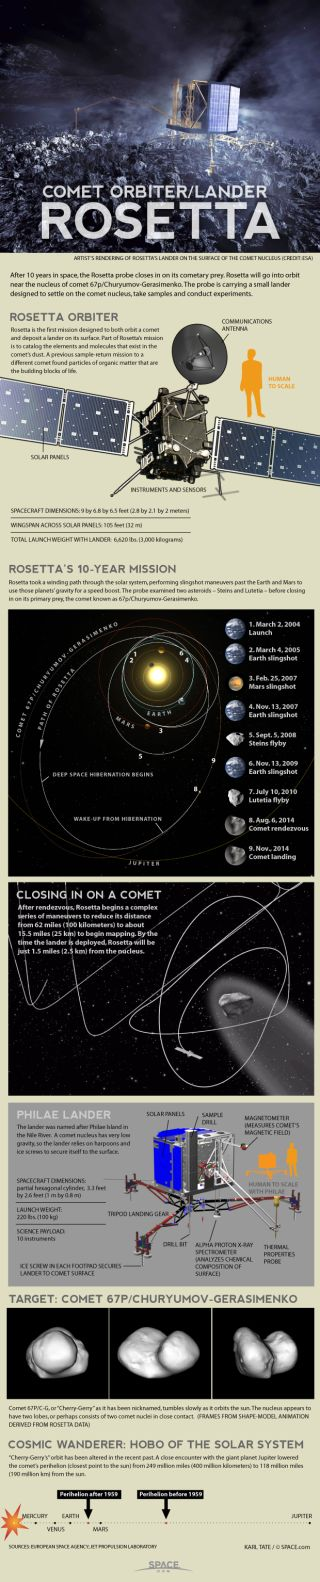 Rosetta spacecraft will orbit a comet and release a lander.